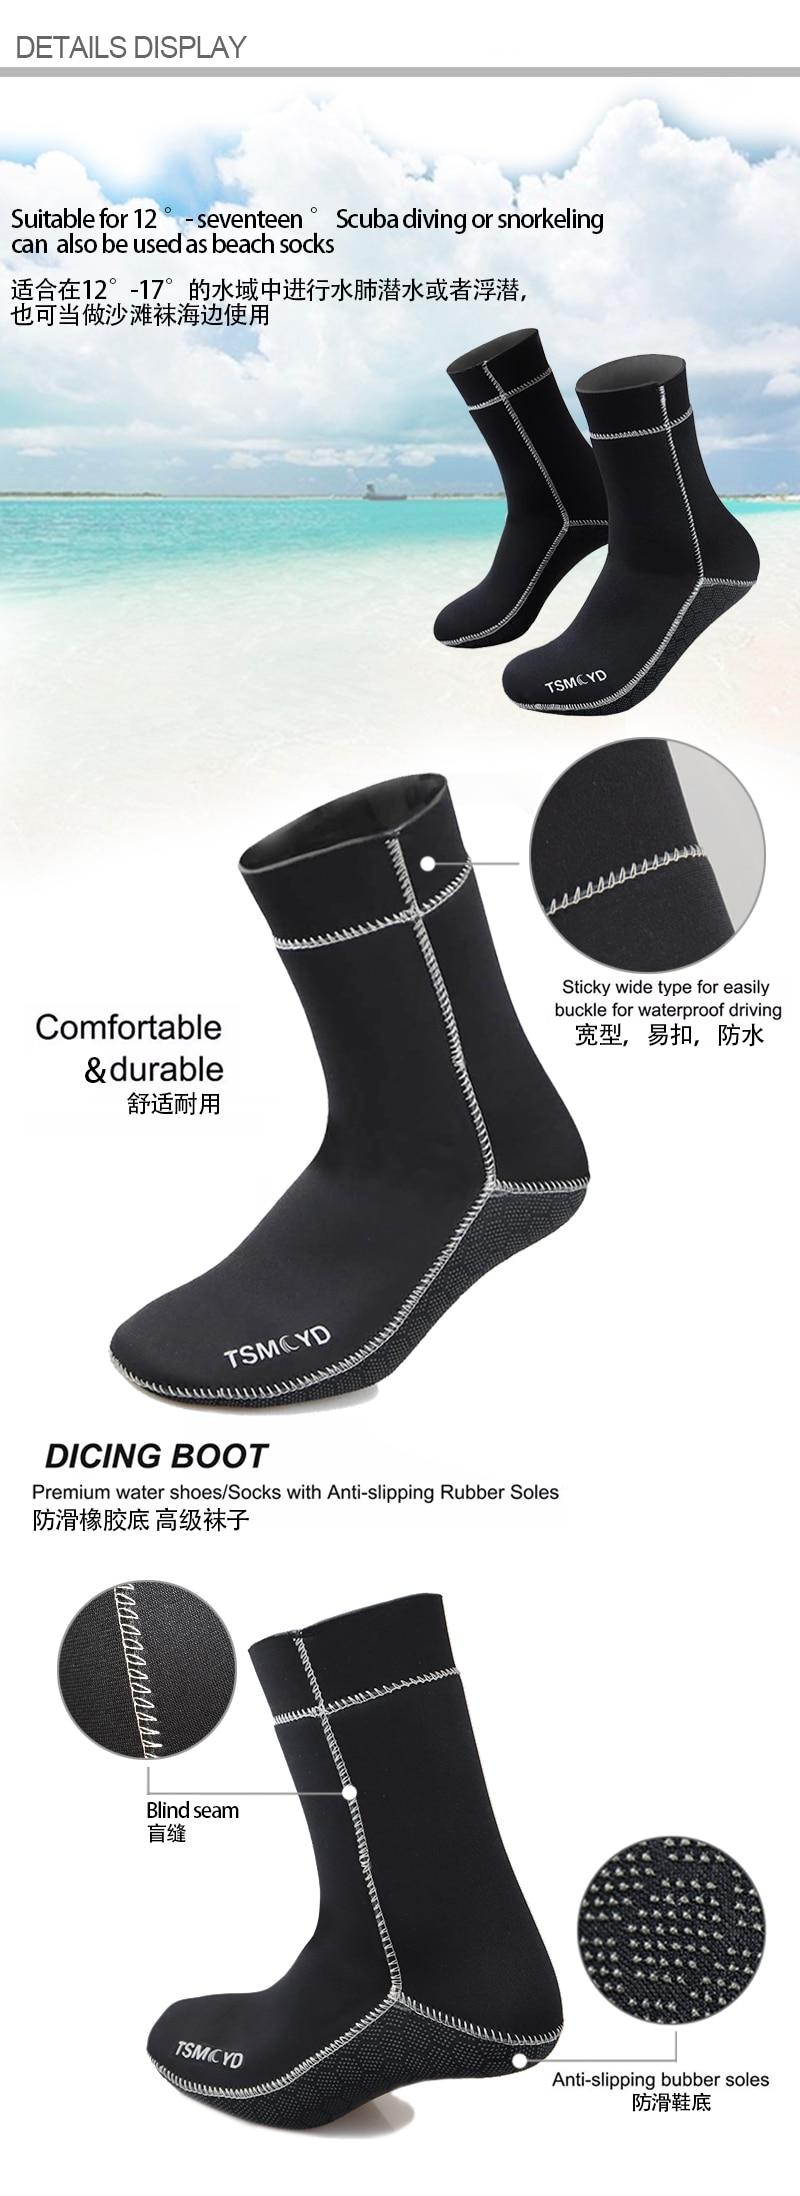 Tauchsocken 3mm / 5mm Neopren Wetsuit Socken Füsslinge